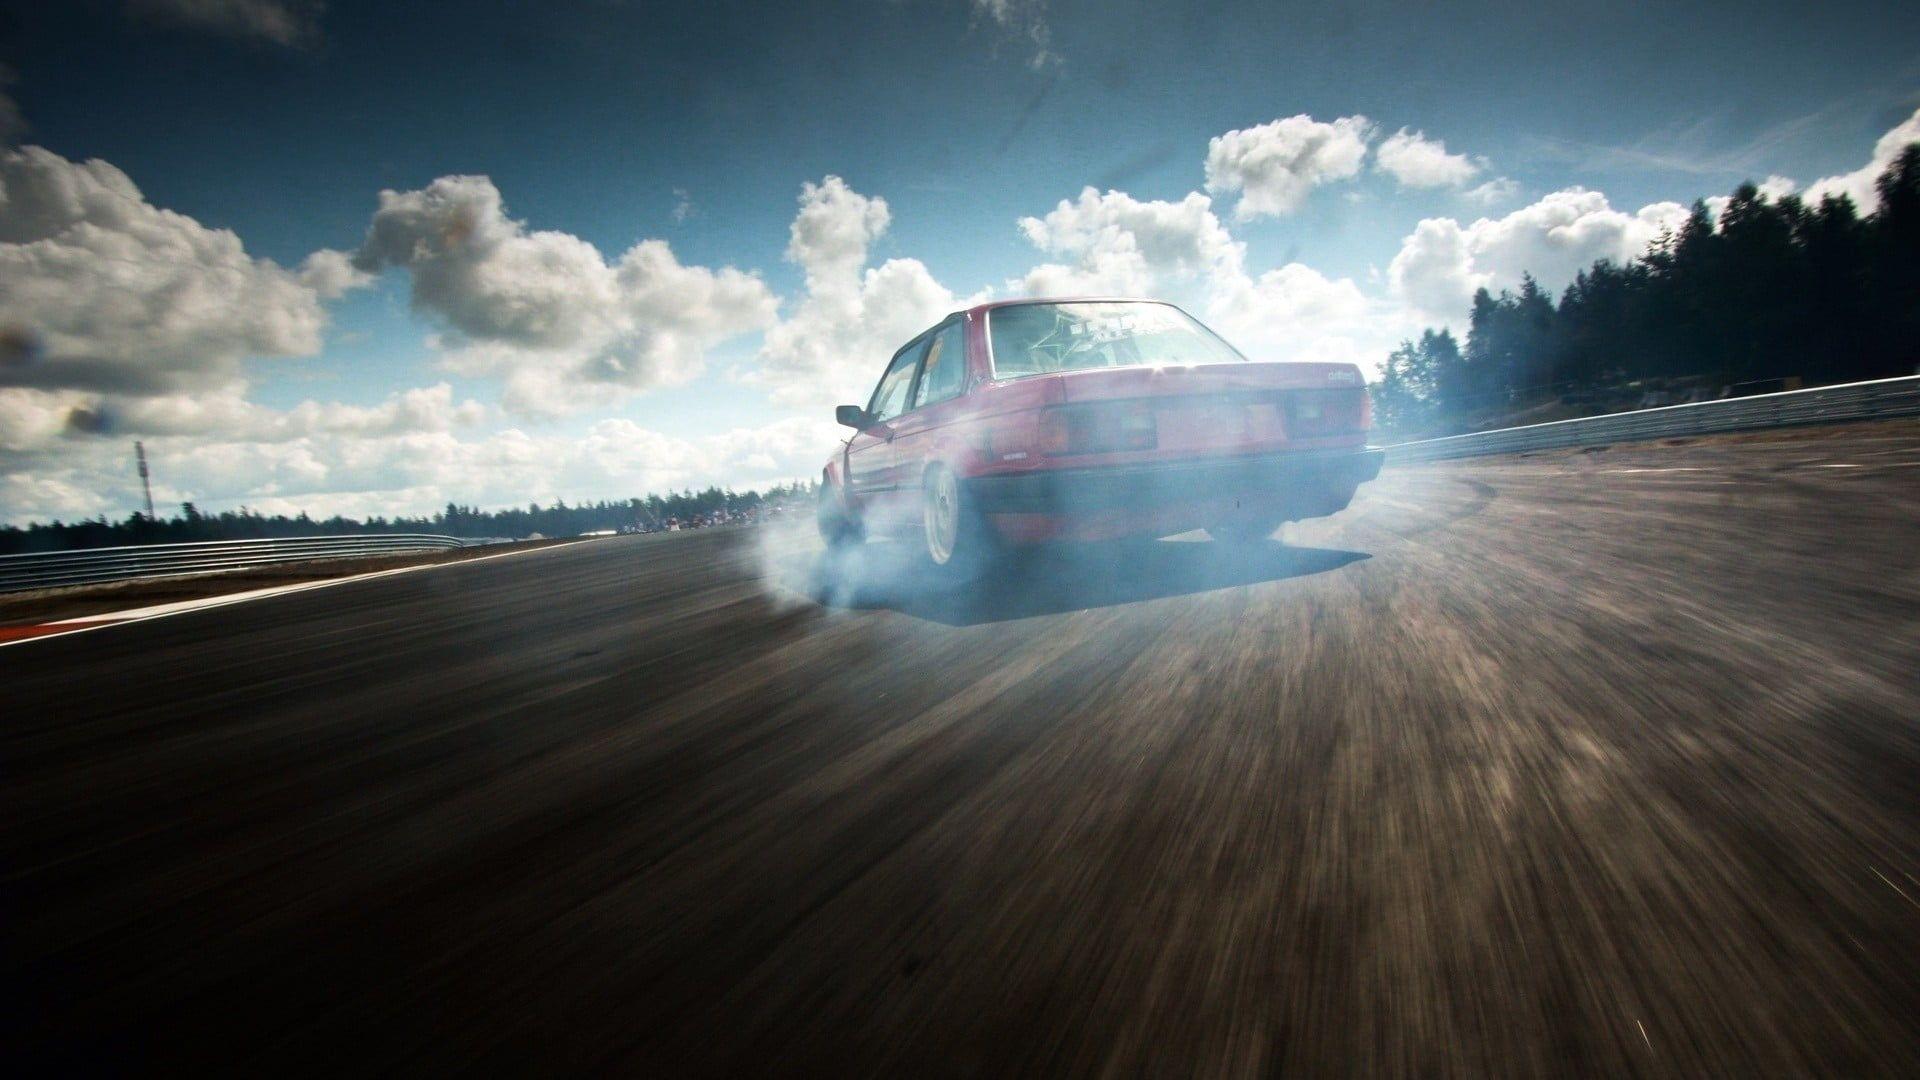 Red Car Drift Smoke Car Clouds Sky Race Tracks Bmw E30 Vehicle 1080p Wallpaper Hdwallpaper Desktop In 2021 Bmw E30 Red Car E30 Drift